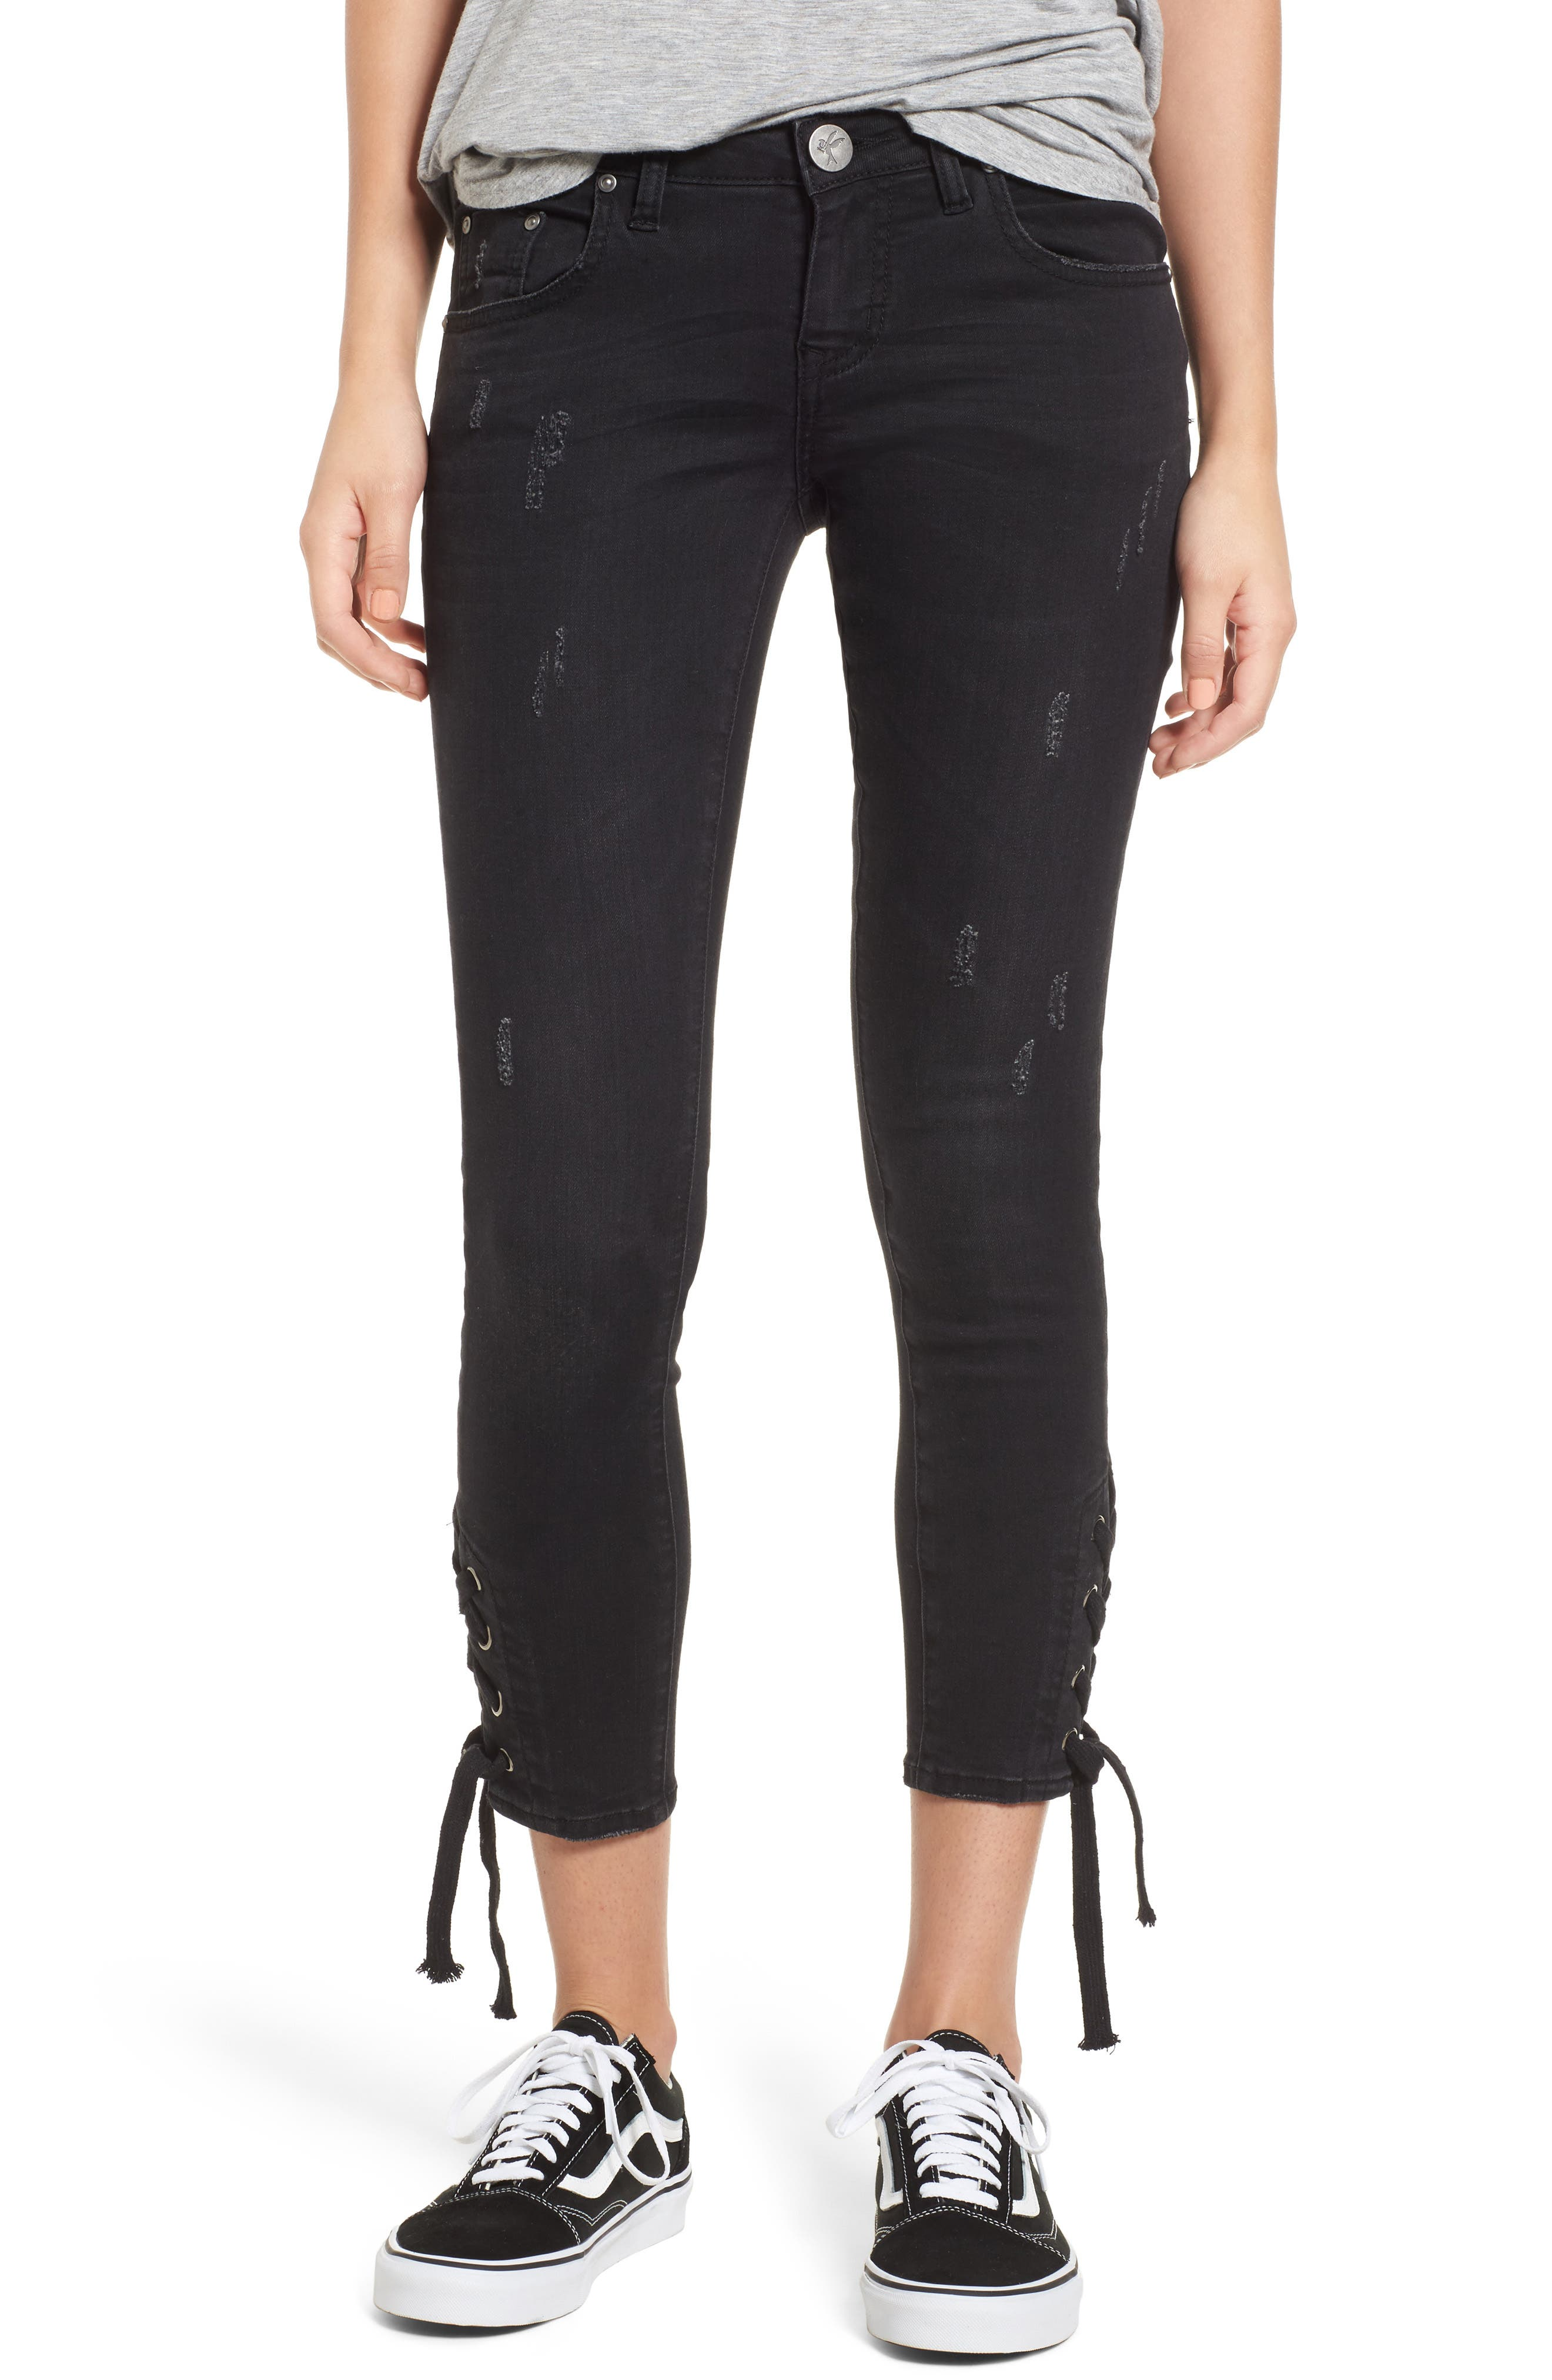 Freebirds Side Tie Crop Skinny Jeans,                             Main thumbnail 1, color,                             Black Paris